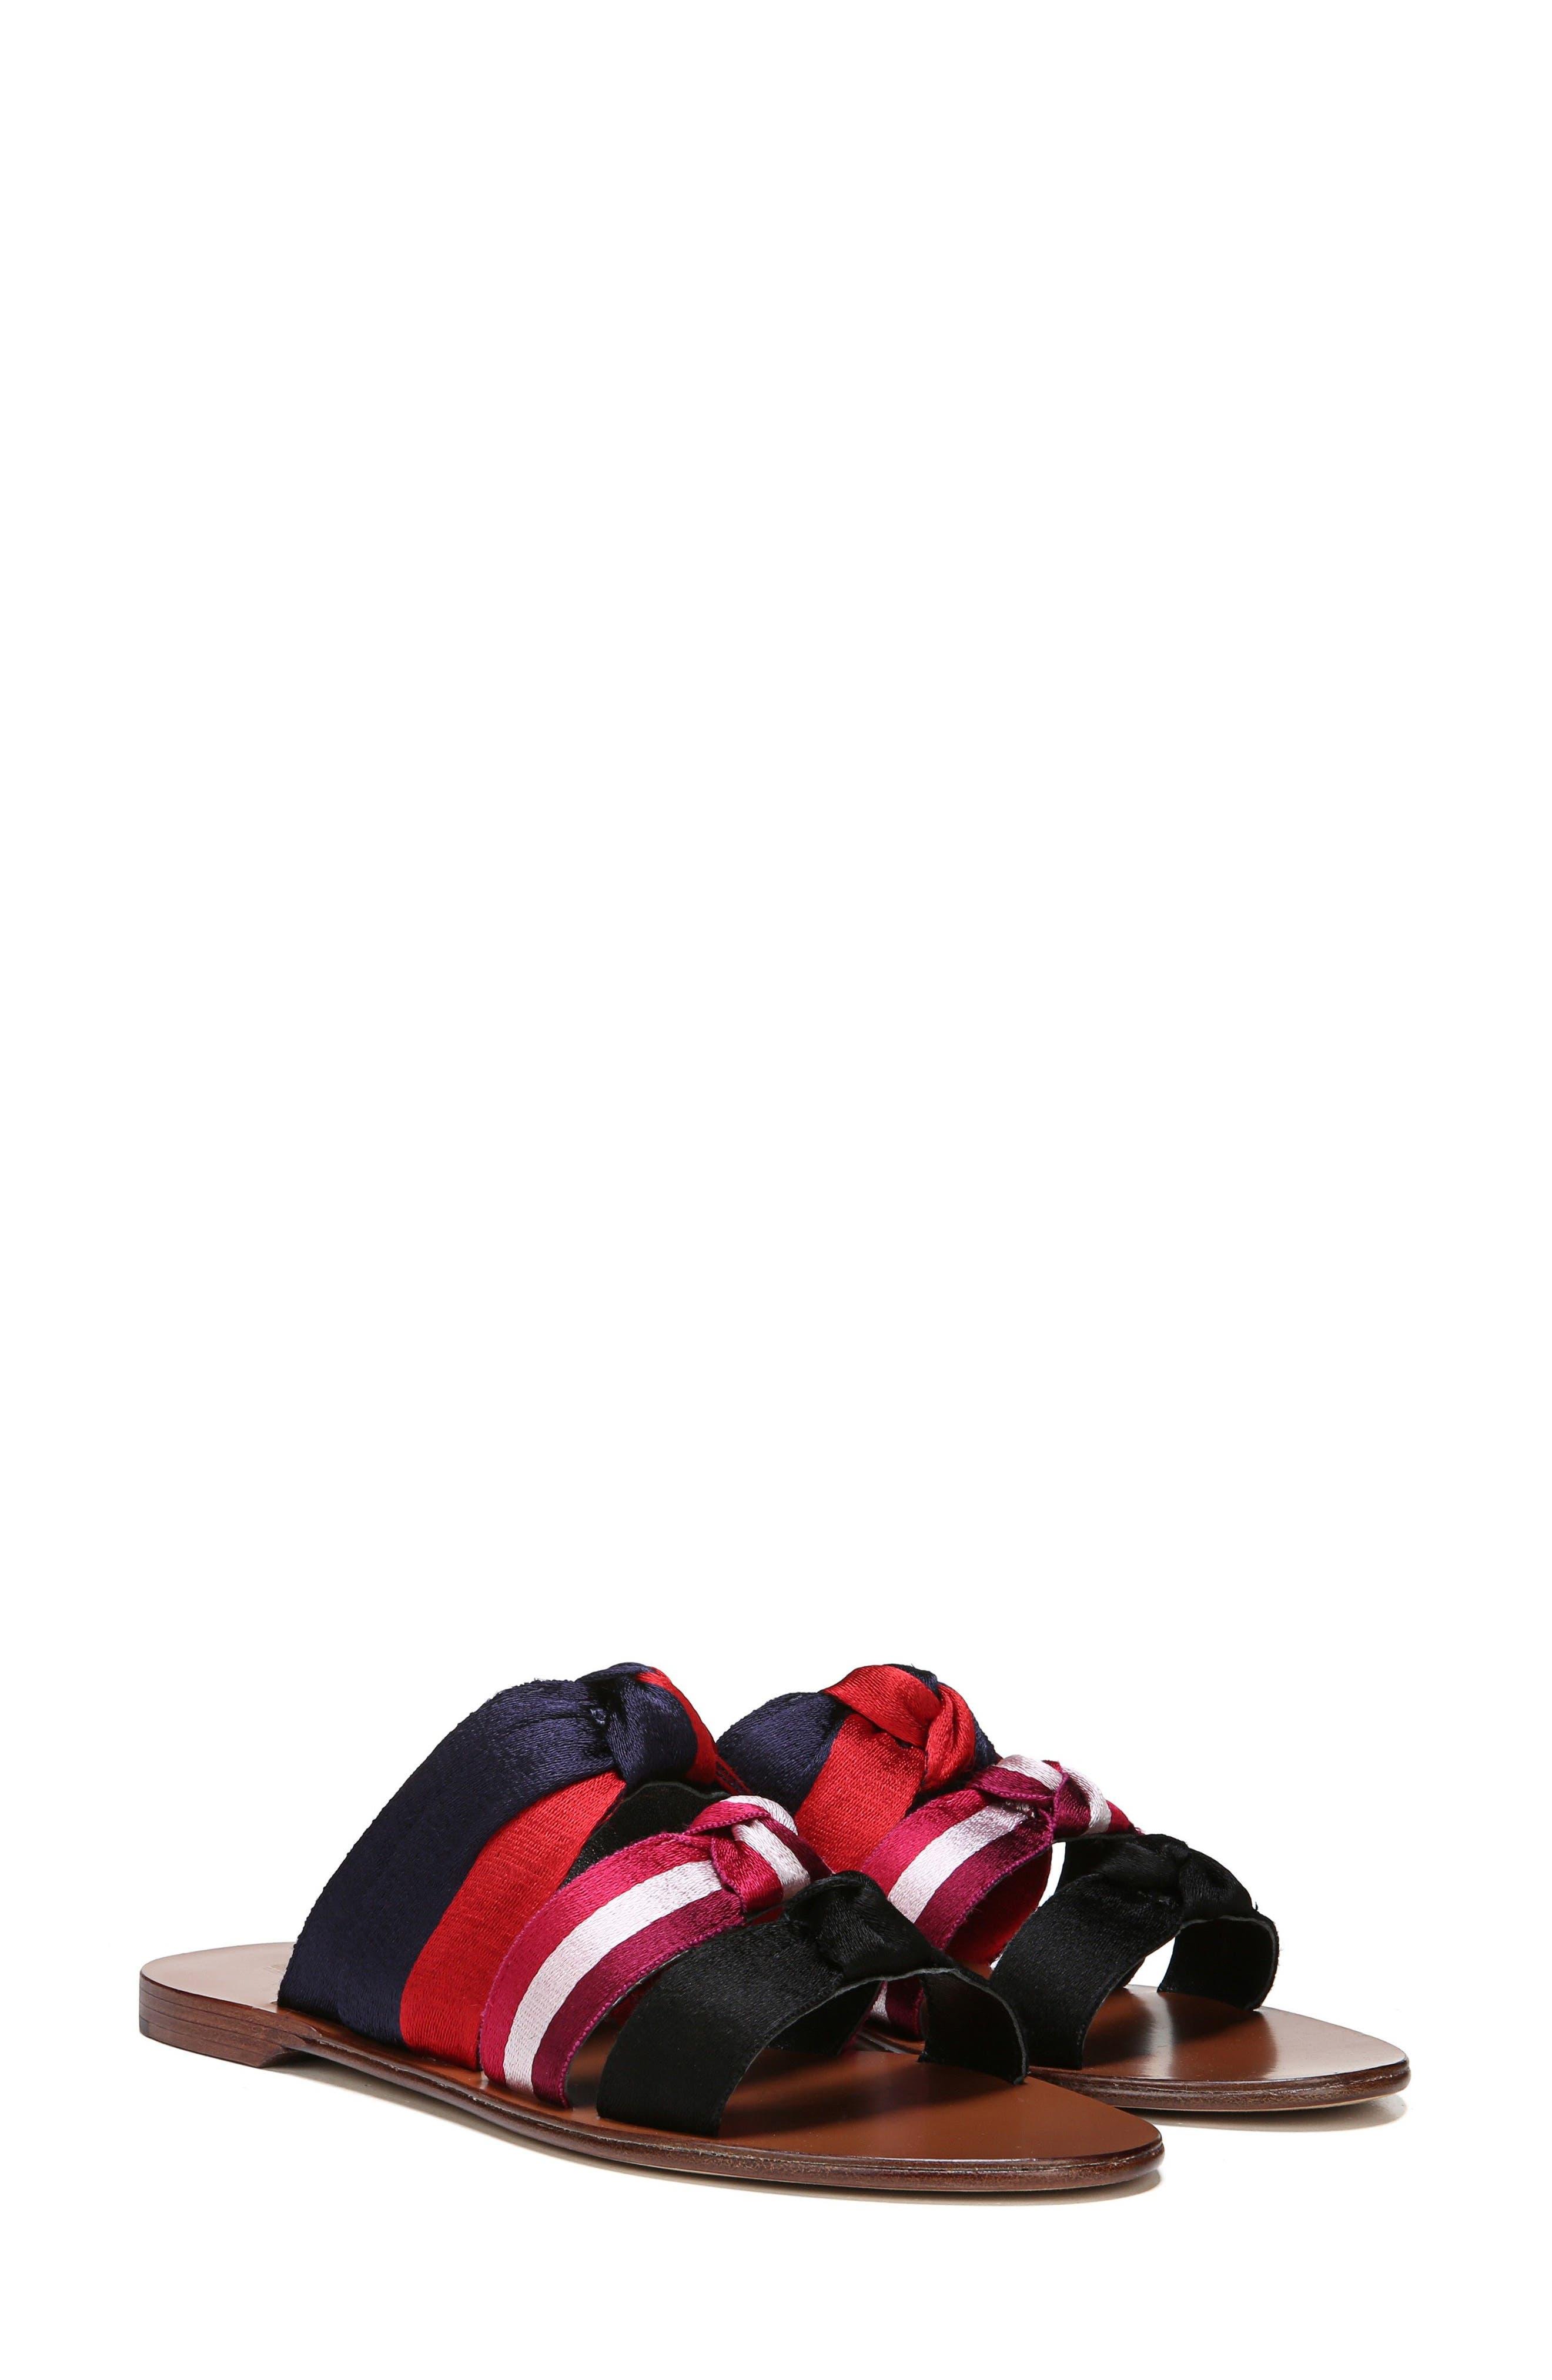 Bree Strappy Slide Sandal,                             Alternate thumbnail 7, color,